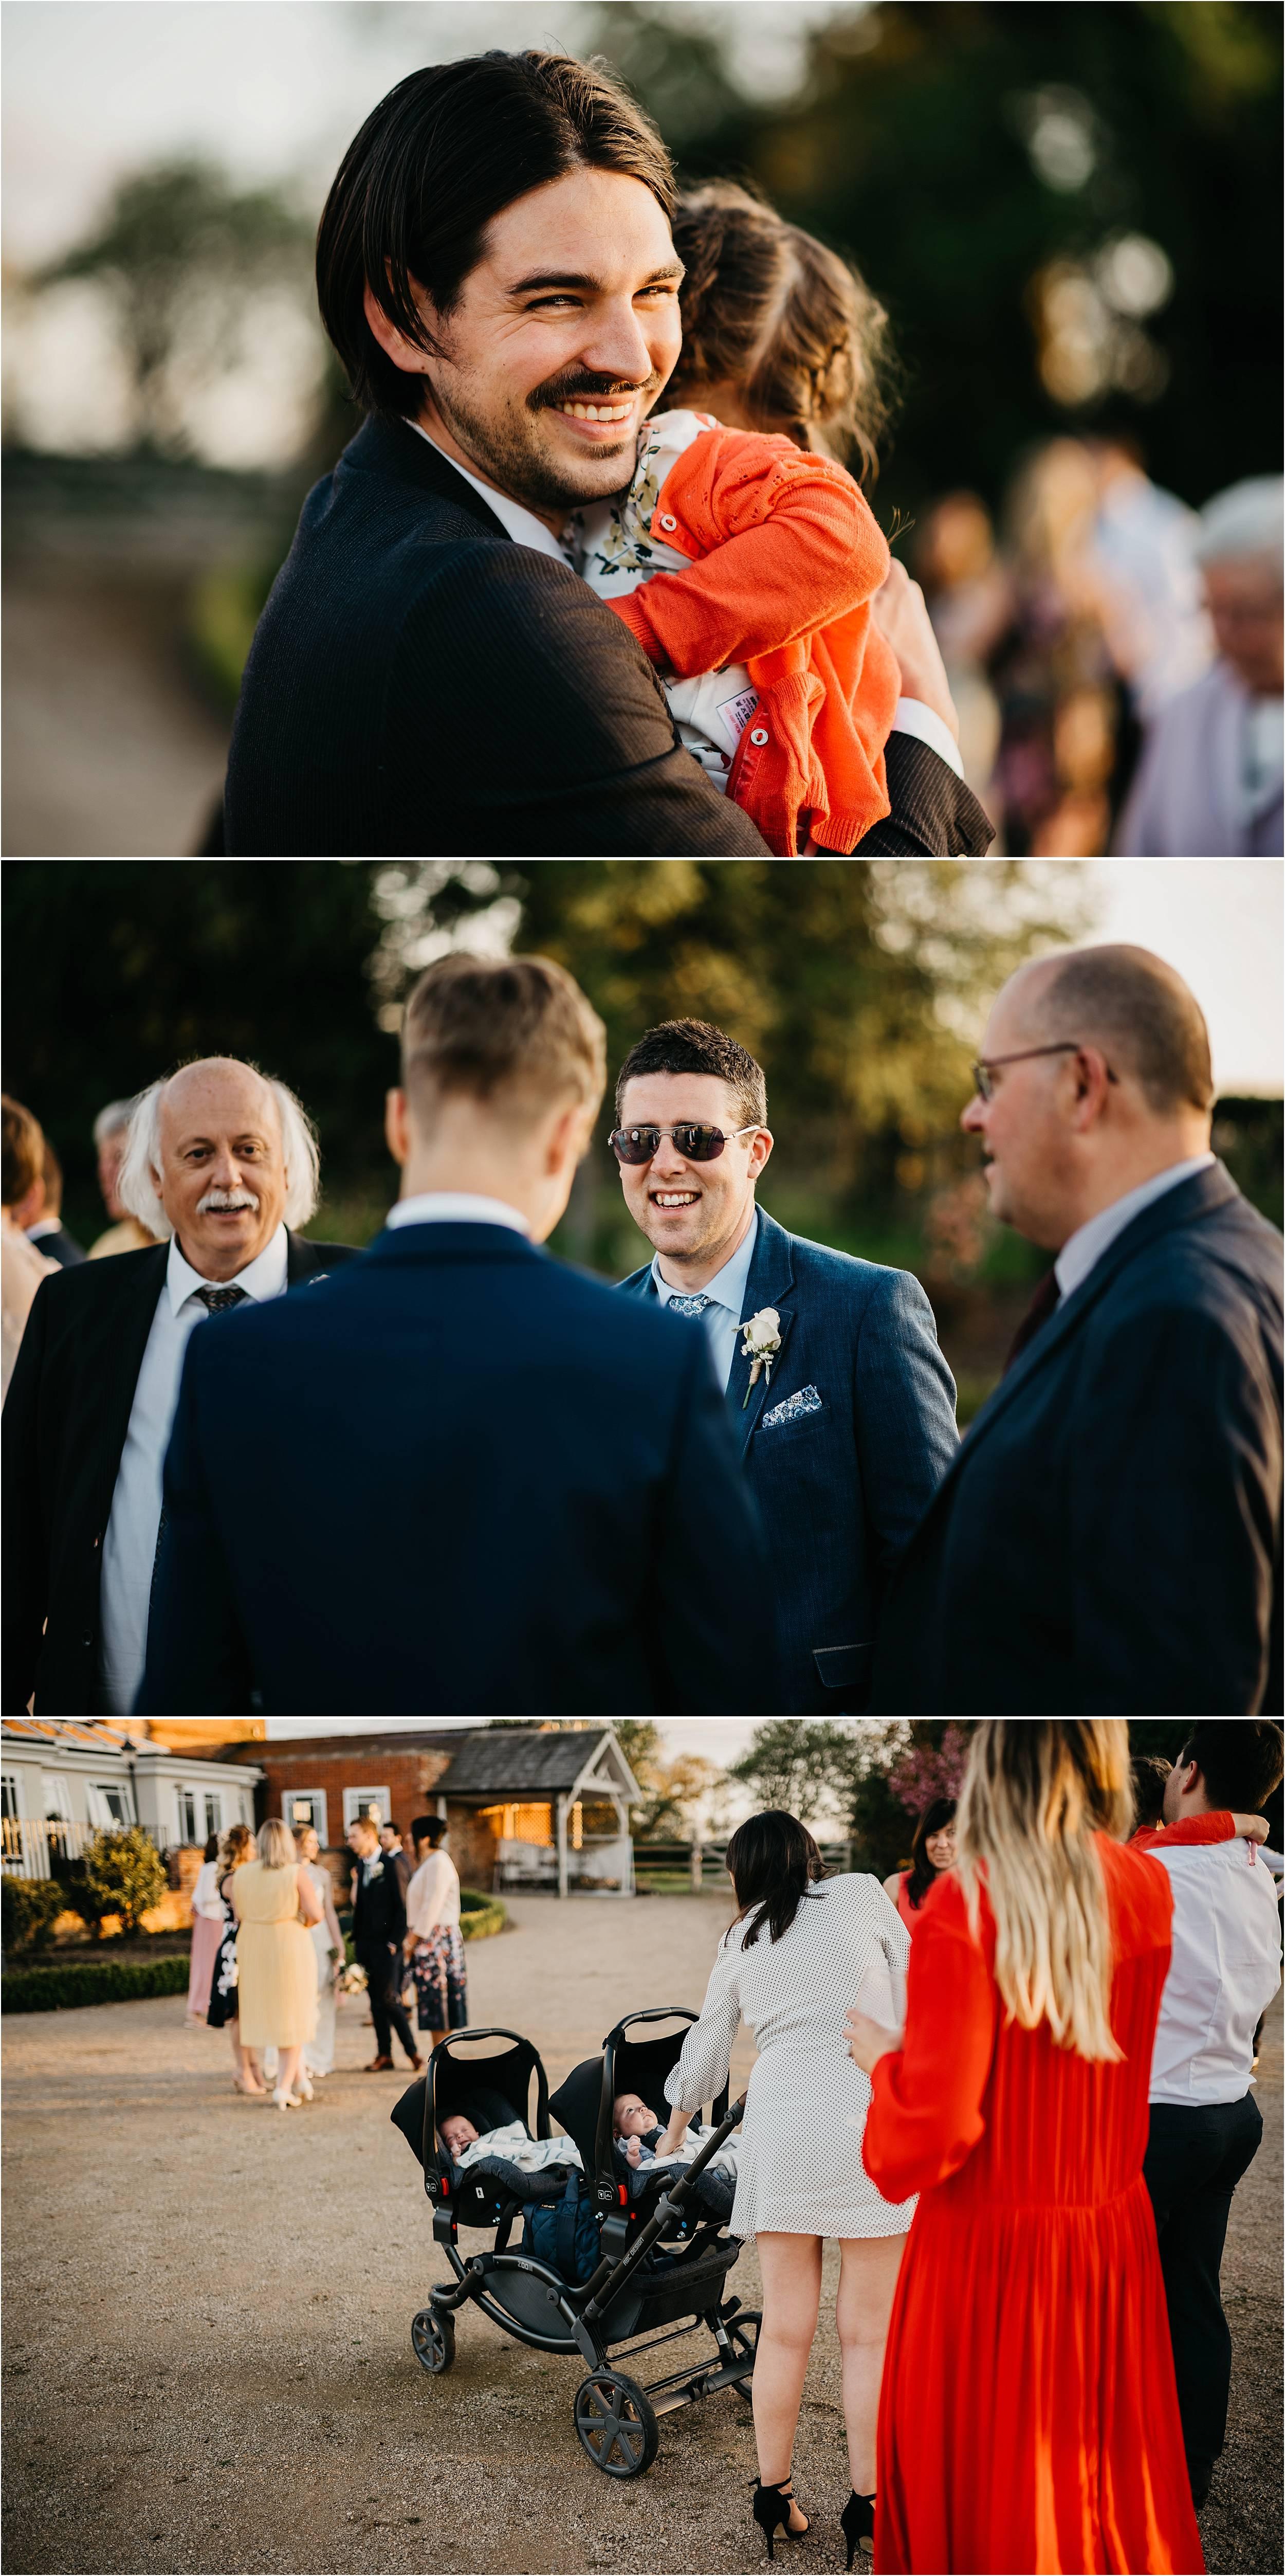 Kedleston Country House Wedding Photography_0100.jpg